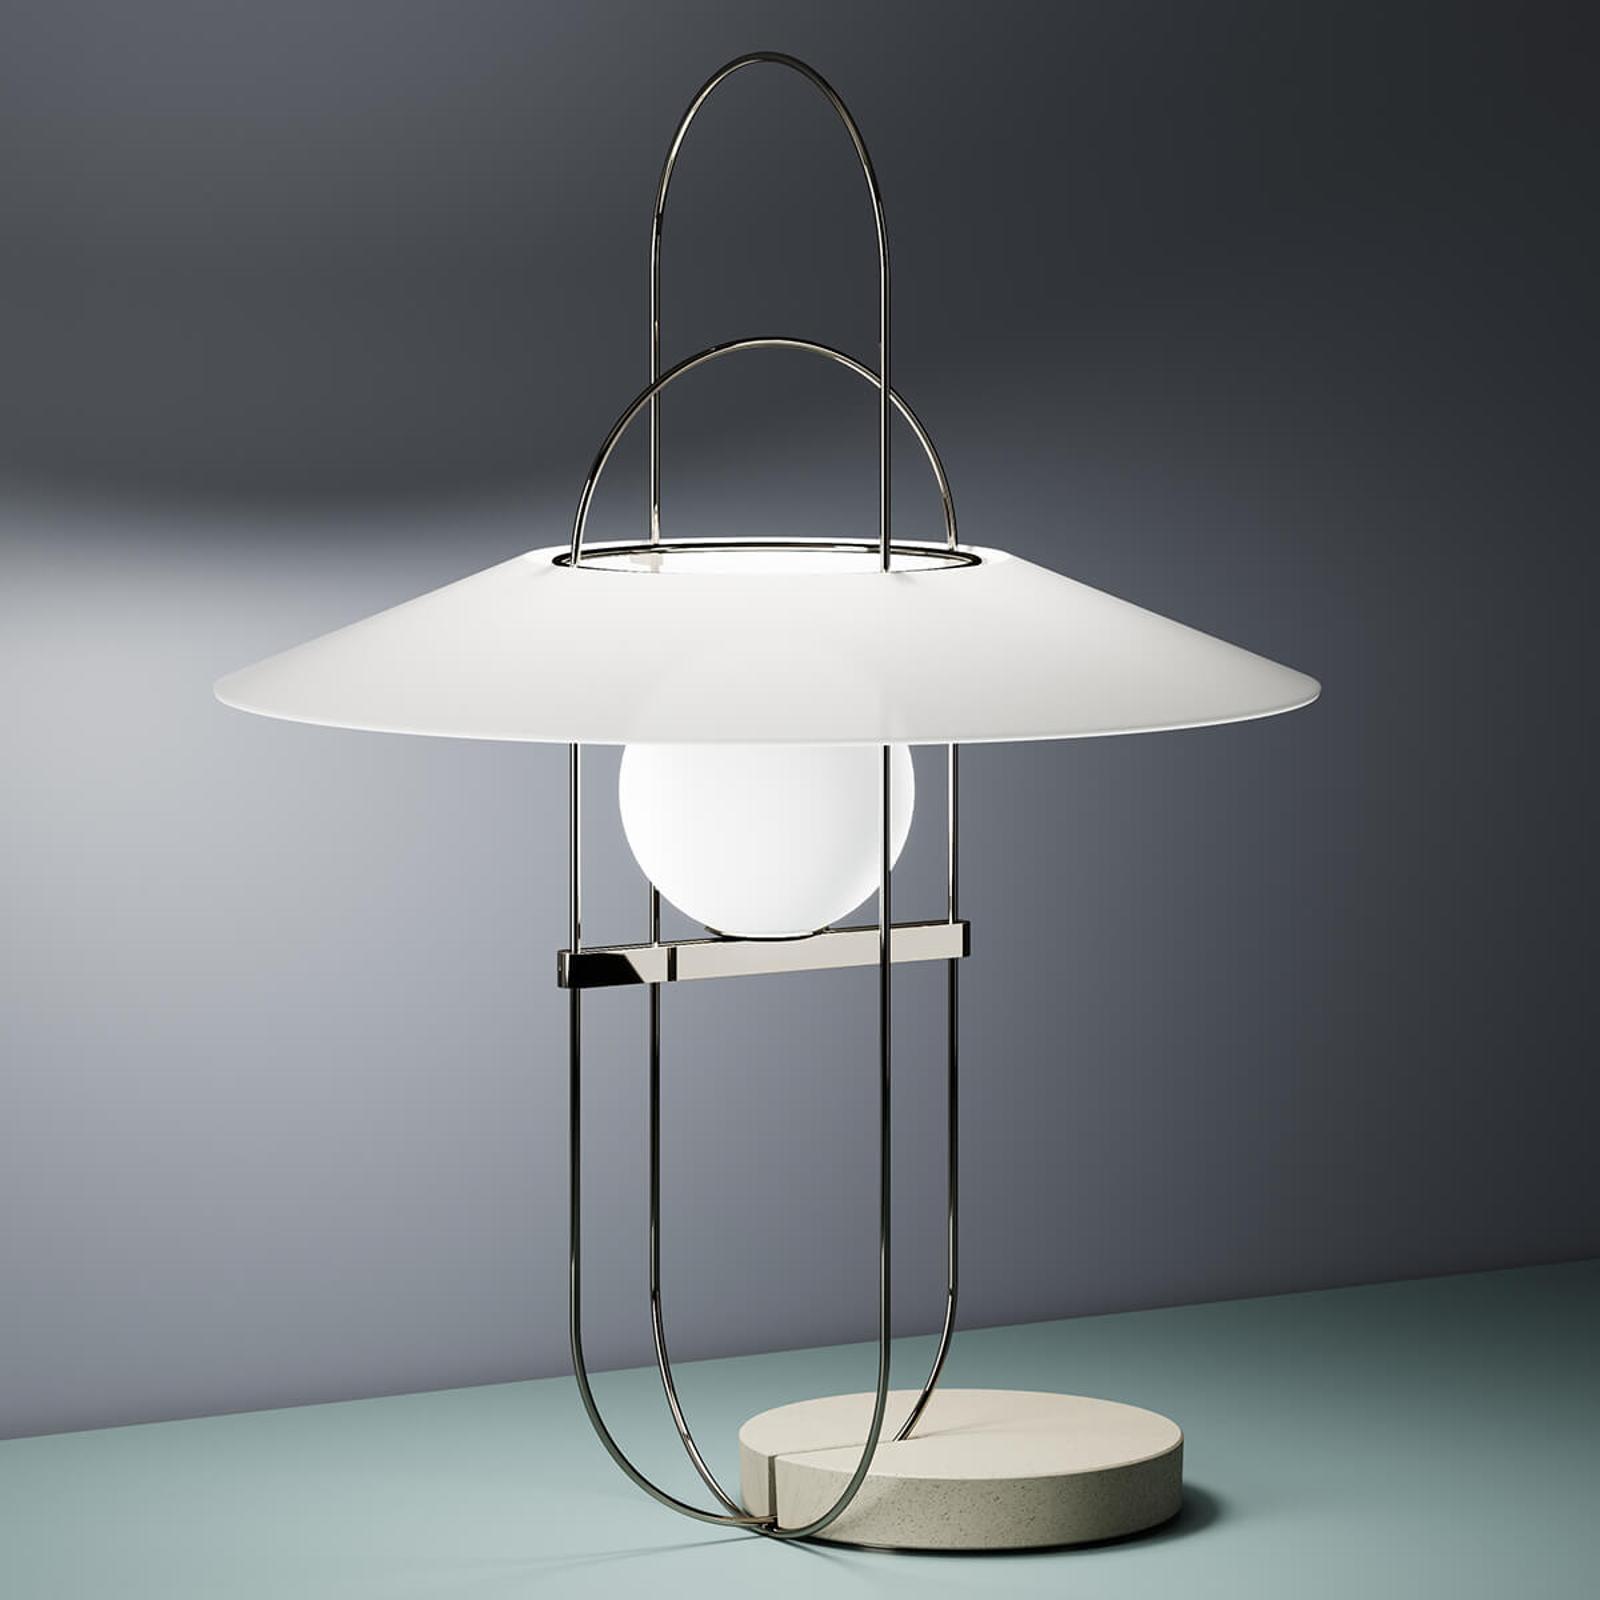 Filigranowa lampa stołowa LED Setareh chrom i biel